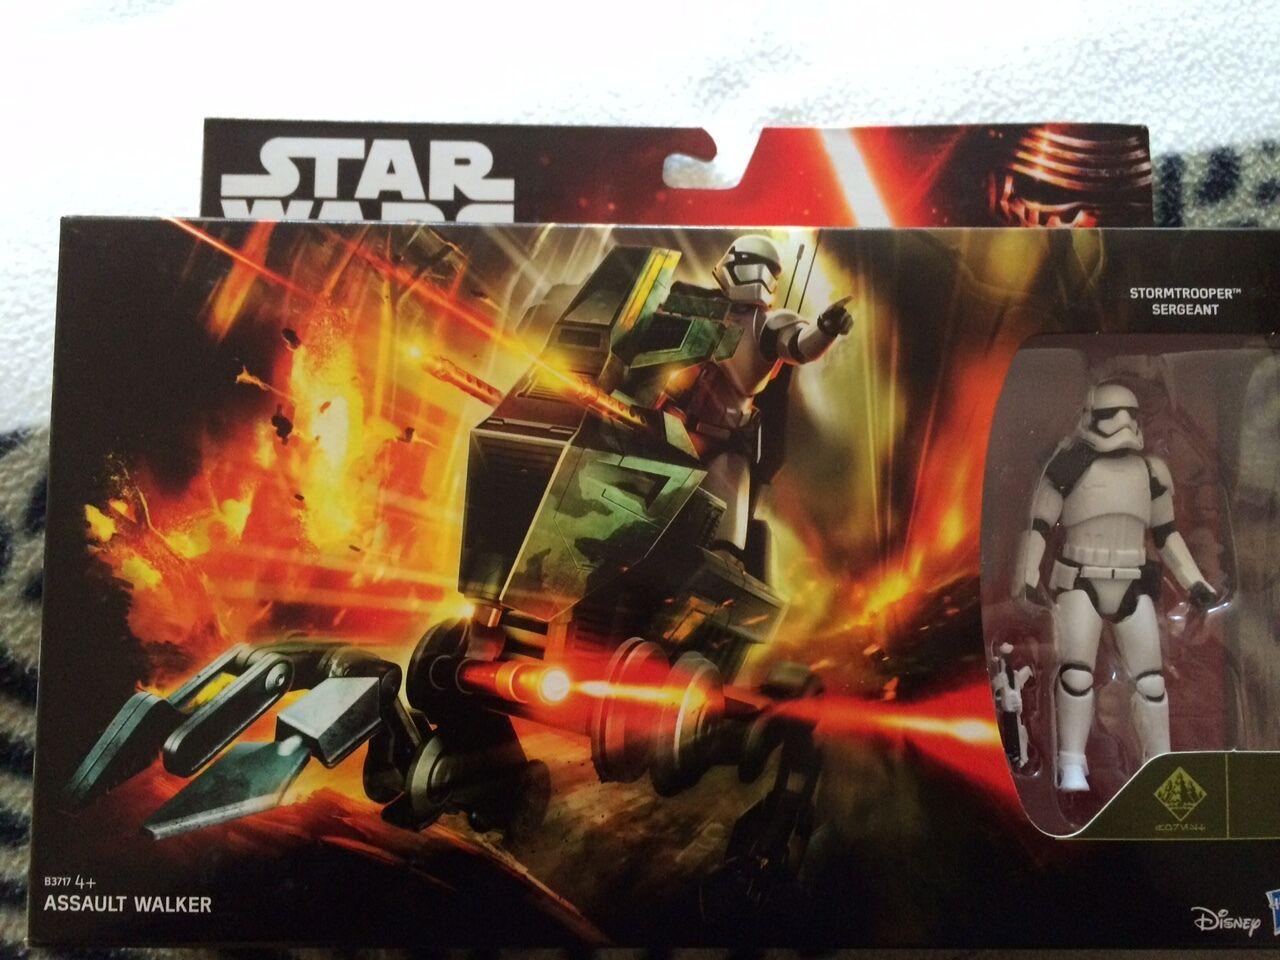 Star Star Star wars the force awakens assault walker vehicle and  stormtrooper  figure set 52890f